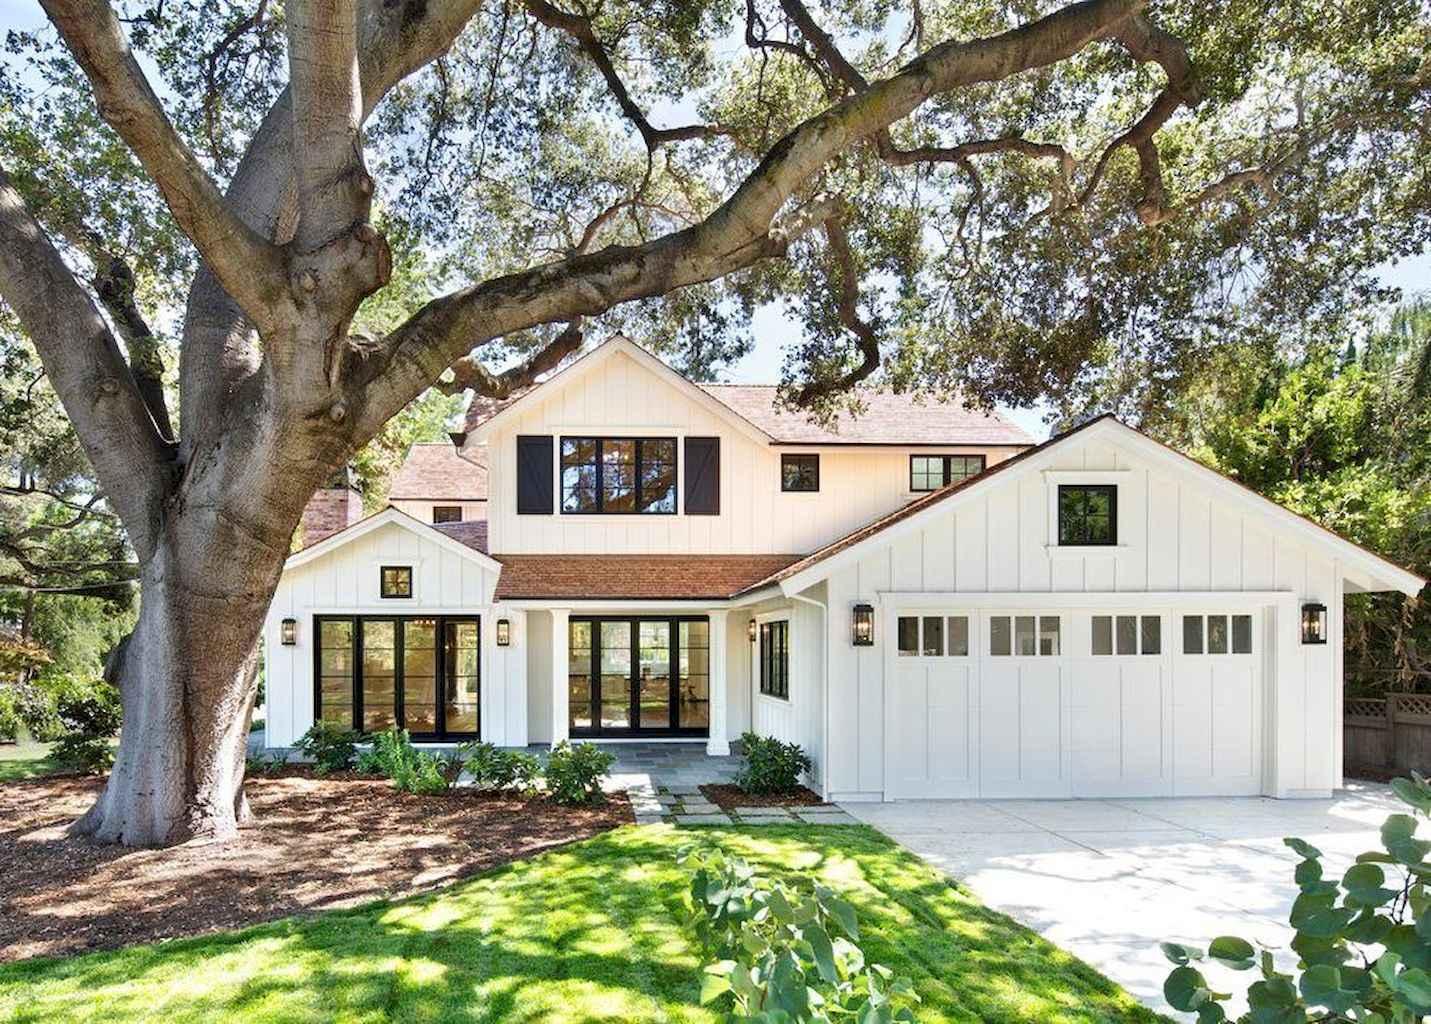 70 Best Modern Farmhouse Exterior Design Ideas - decorapatio.com